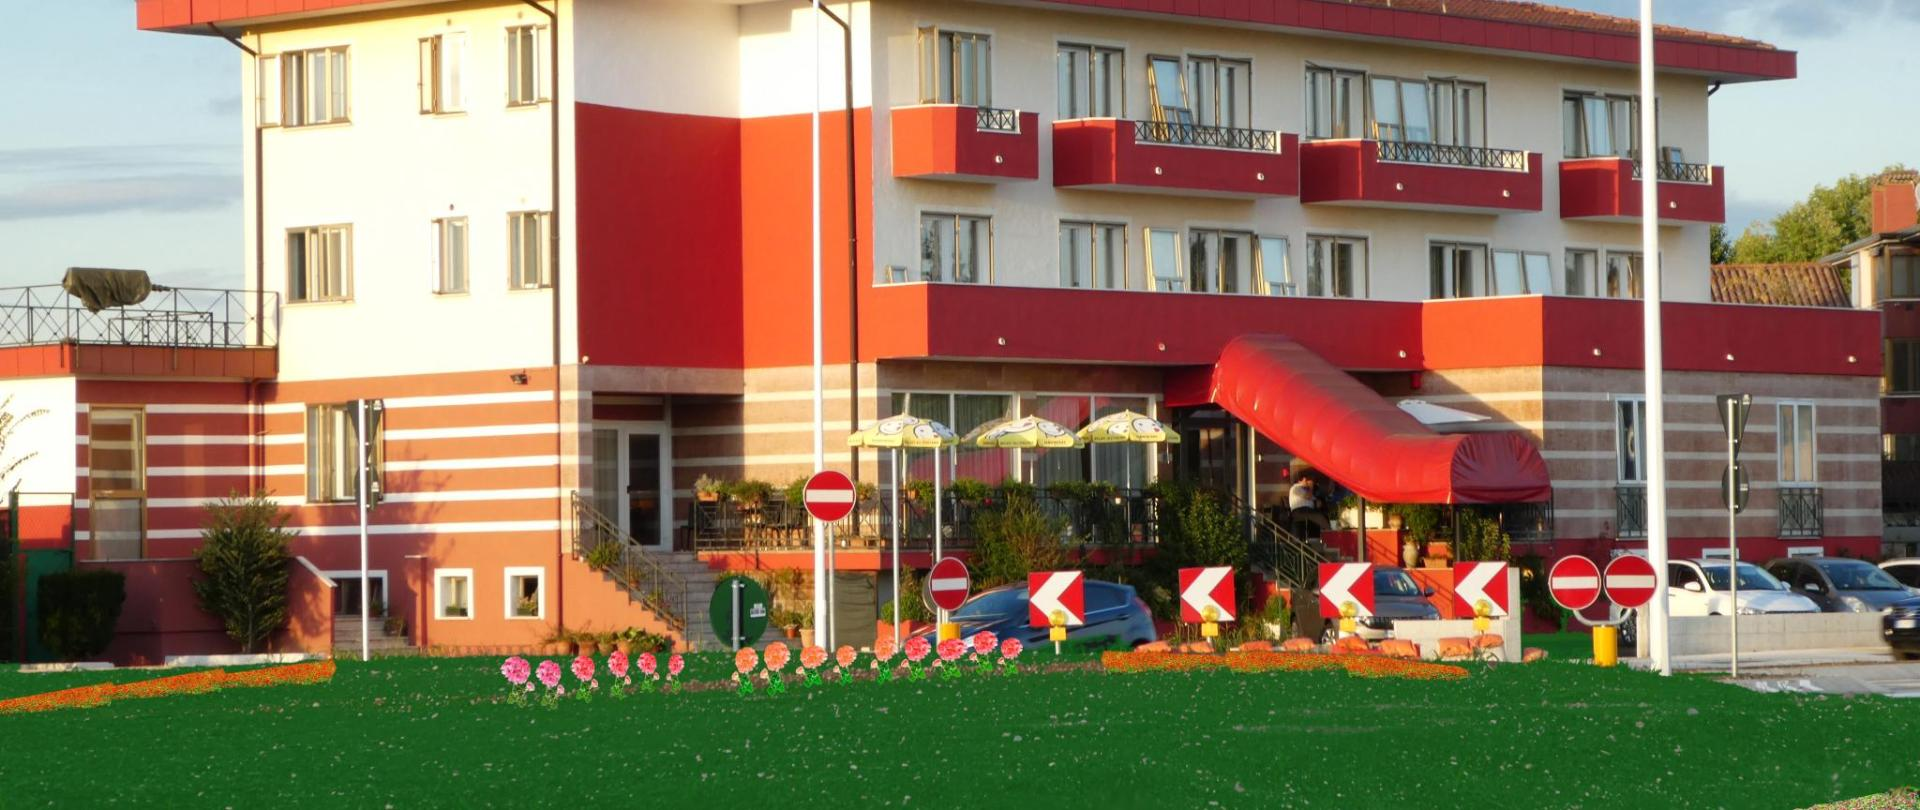 HOTEL ESTERNO.jpg